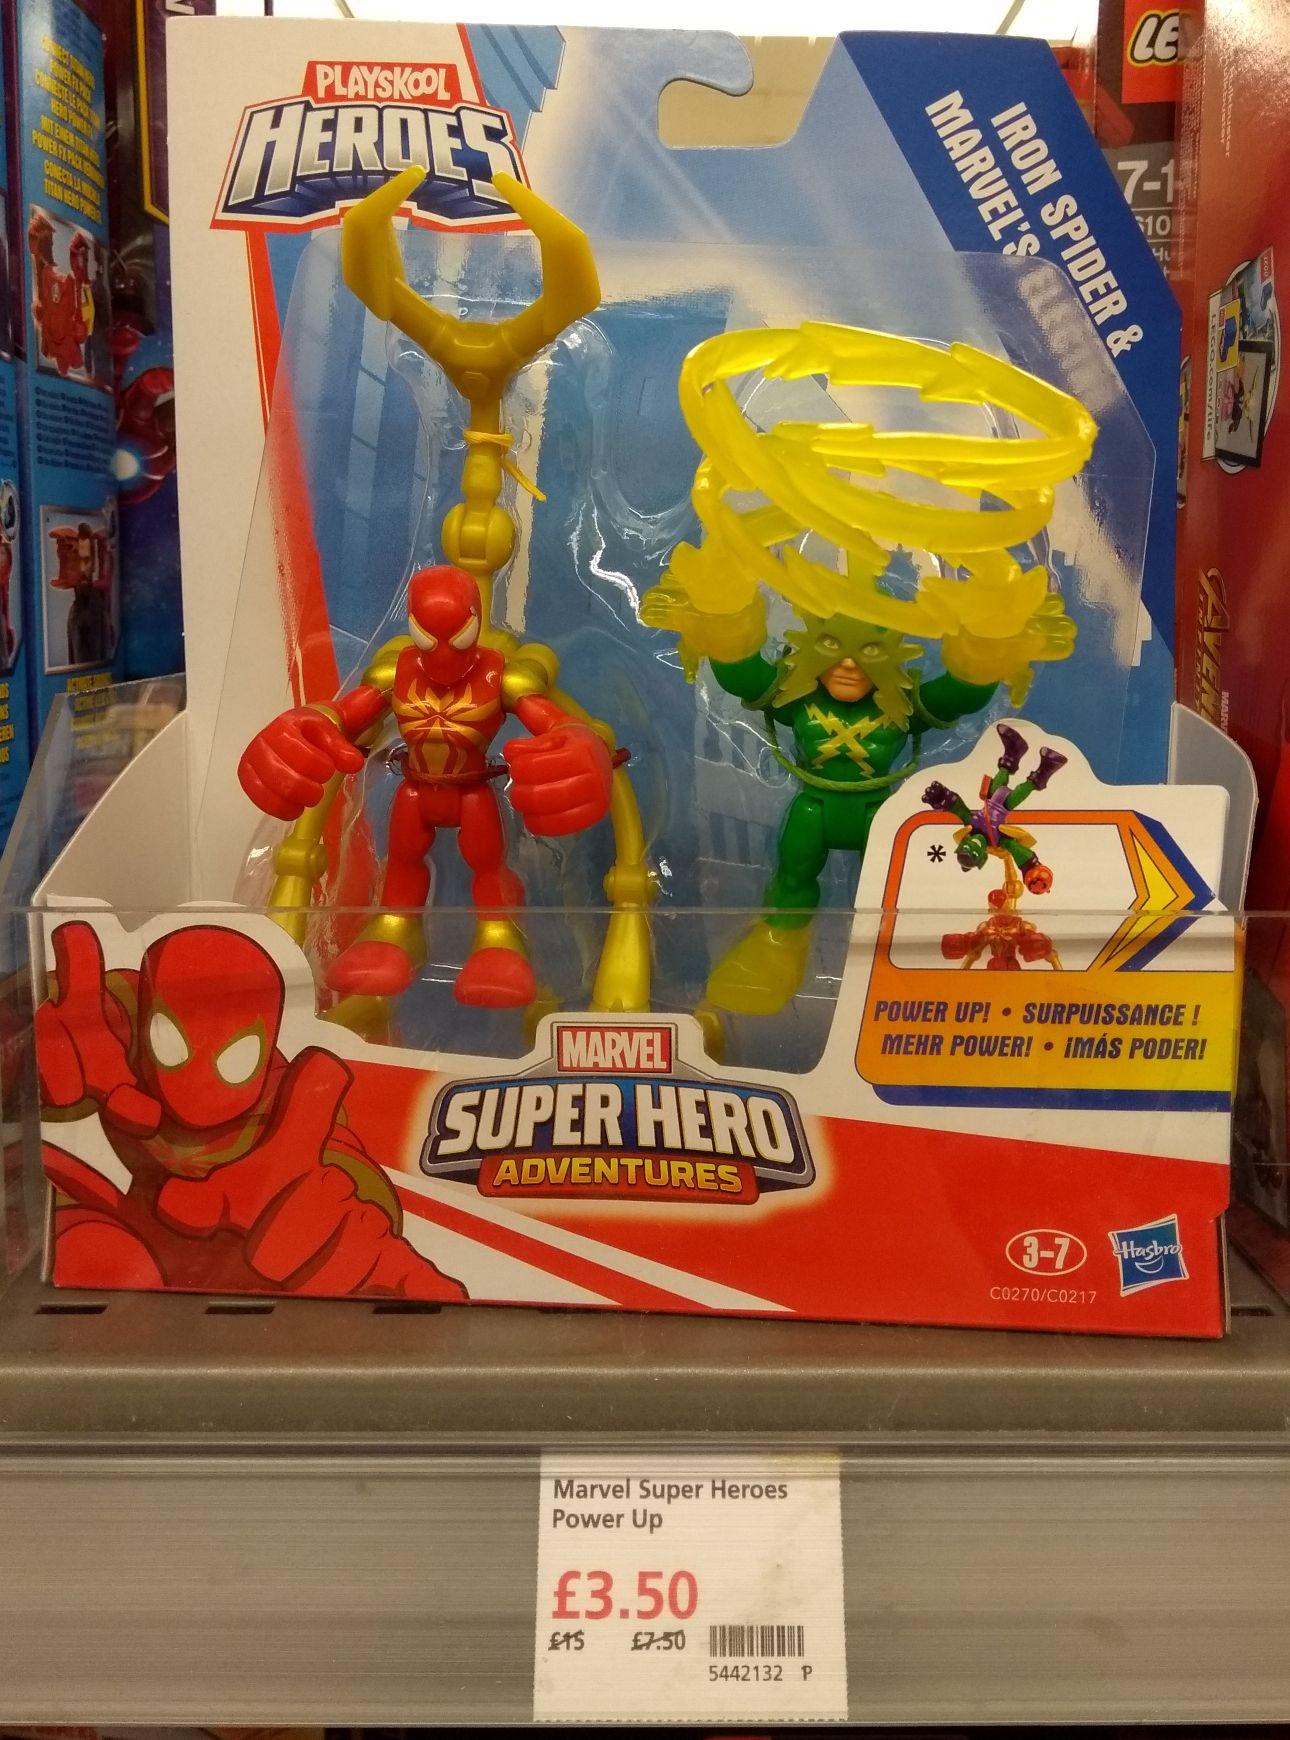 Playskool Heroes Marvel Super Hero Adventures Power Up Action Figures in-store at Waitrose, Willerby, East Yorkshire - £3.50